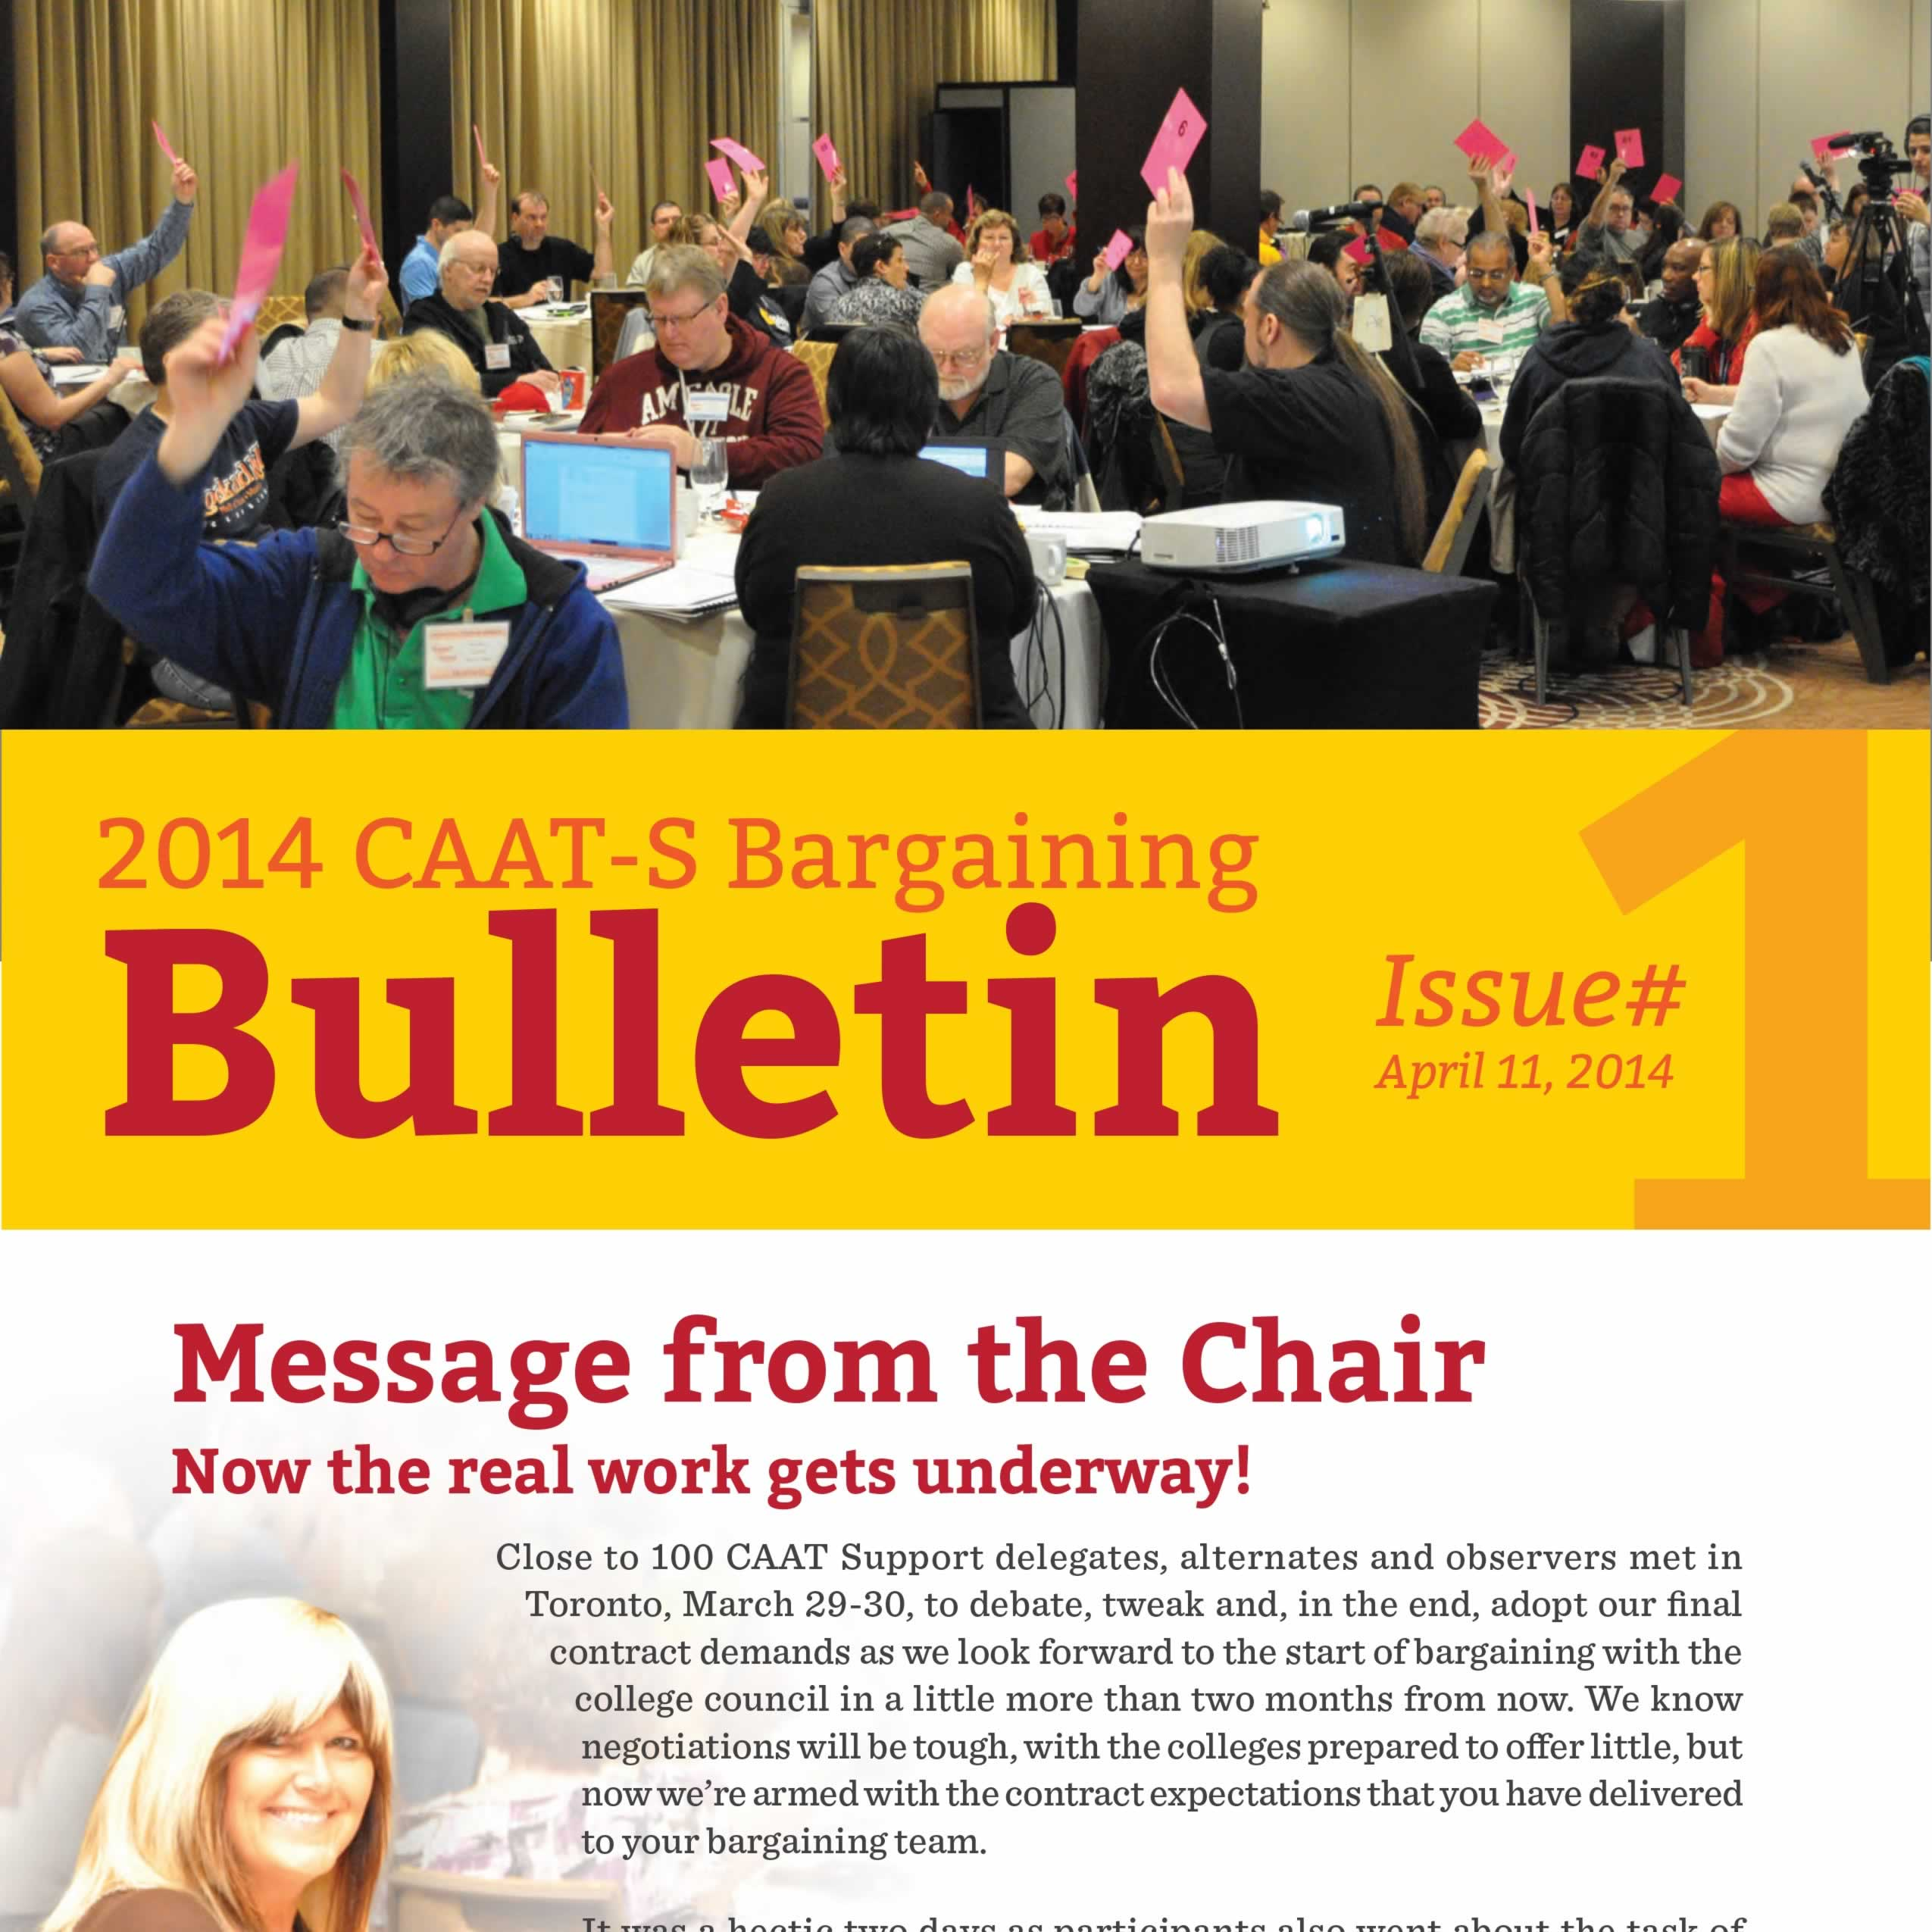 2014 CAAT-S Bargaining Bulletin Issue 1